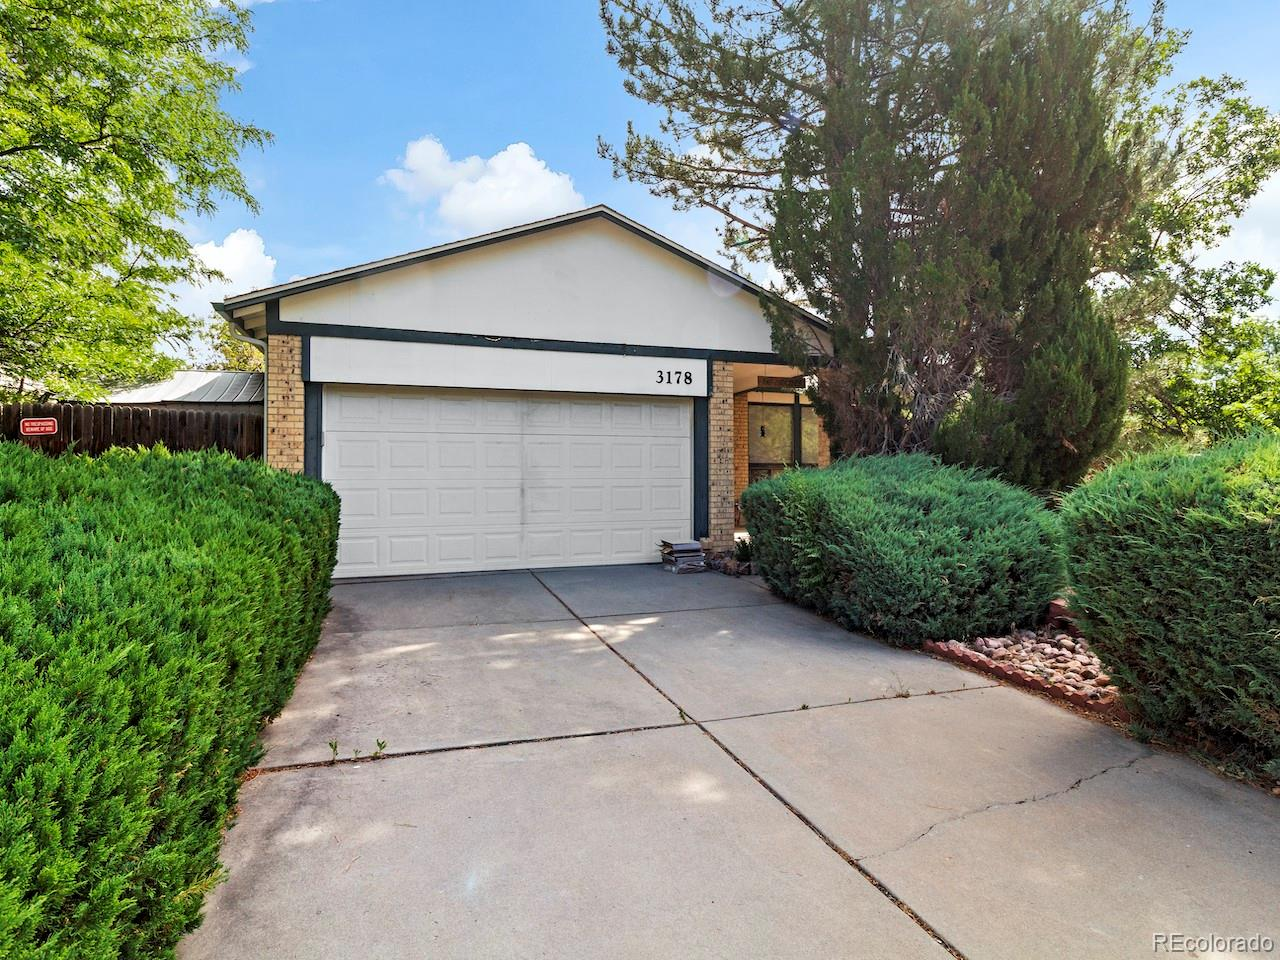 3178 S Kittredge Way Property Photo - Aurora, CO real estate listing